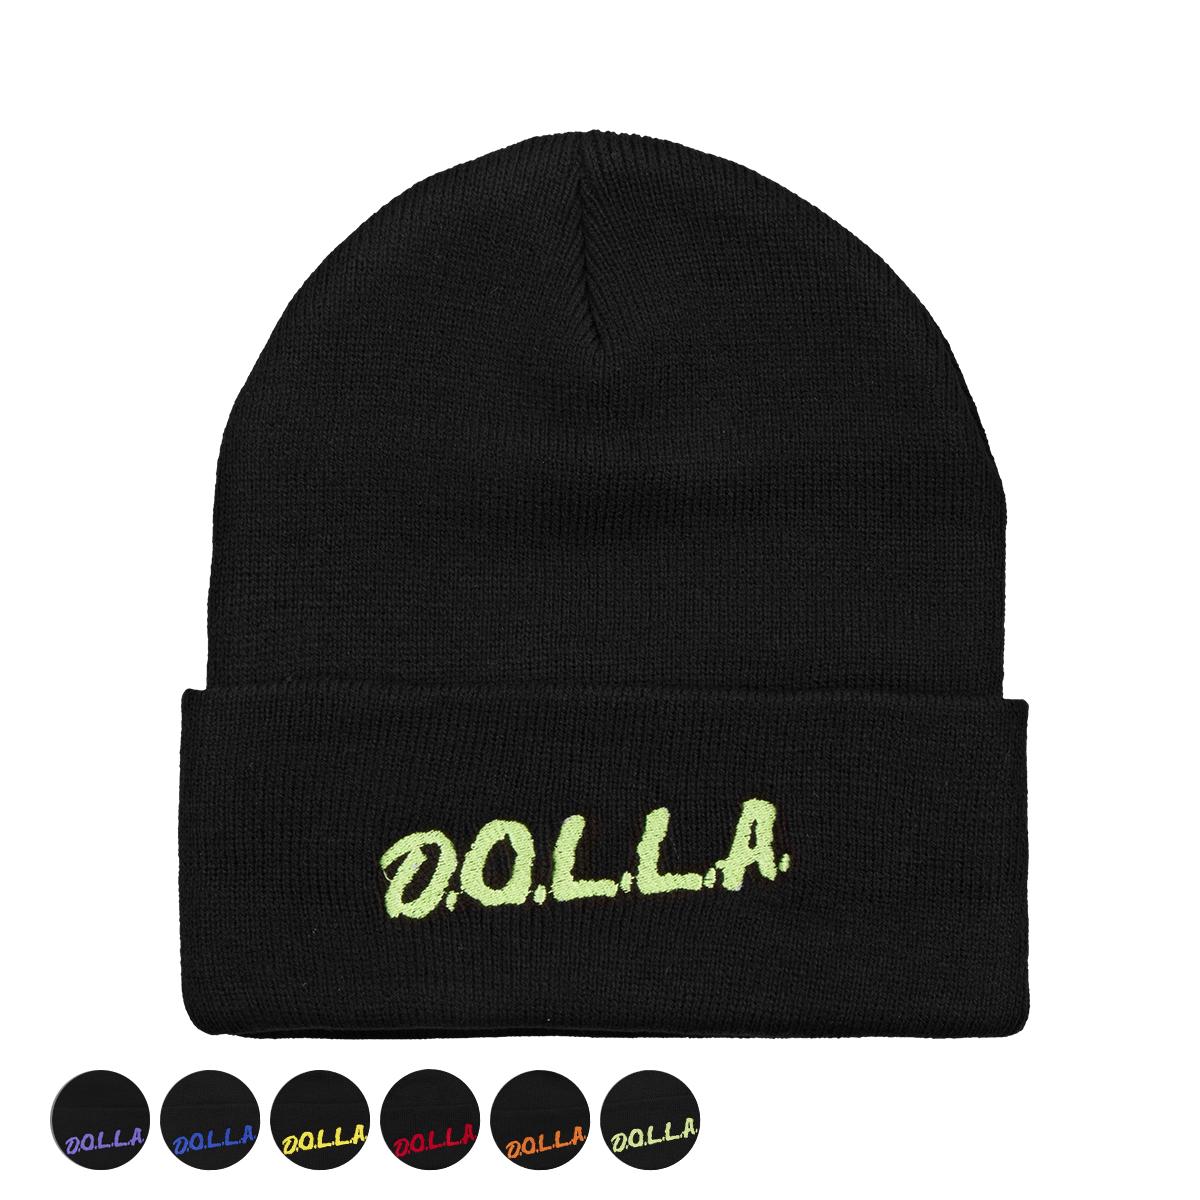 D.O.L.L.A. Beanie & BIG D.O.L.L.A. Deluxe Digital Download